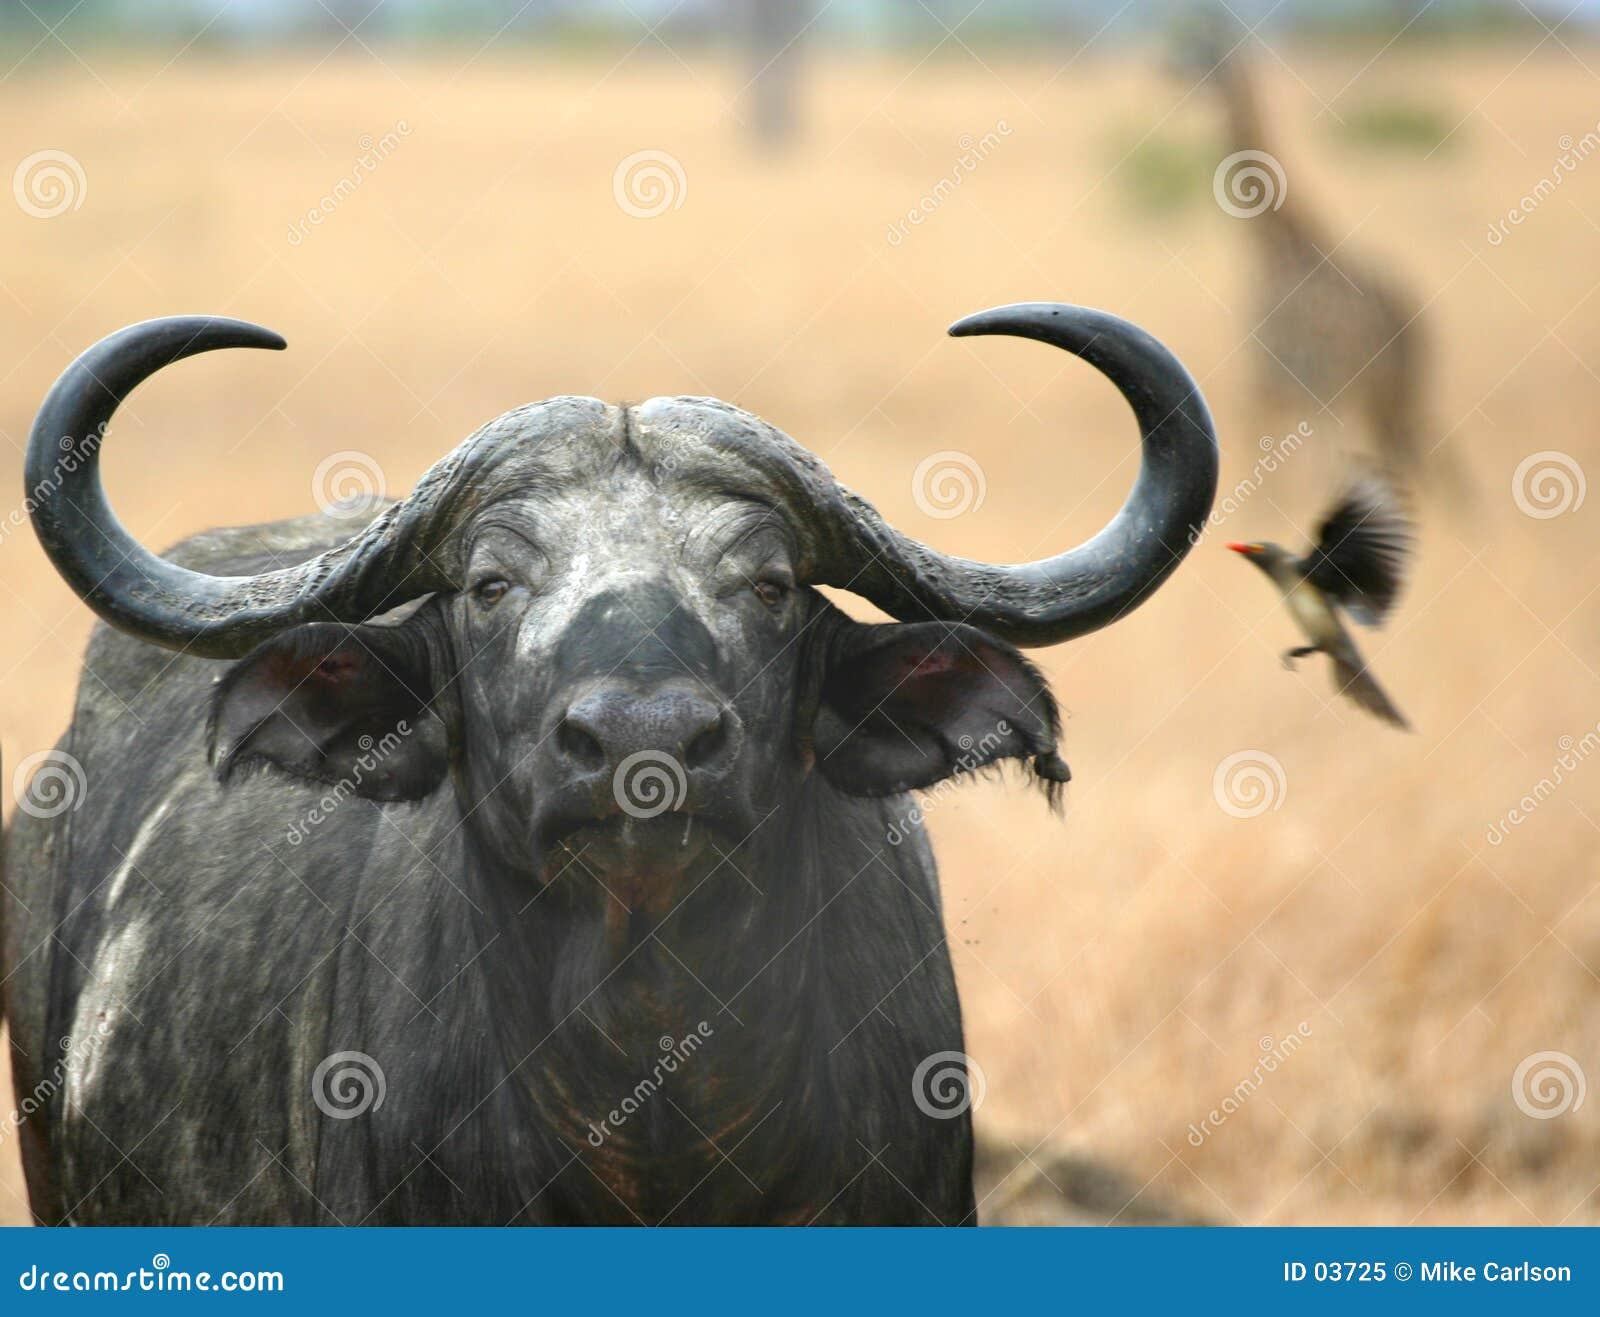 水牛长颈鹿oxpecker